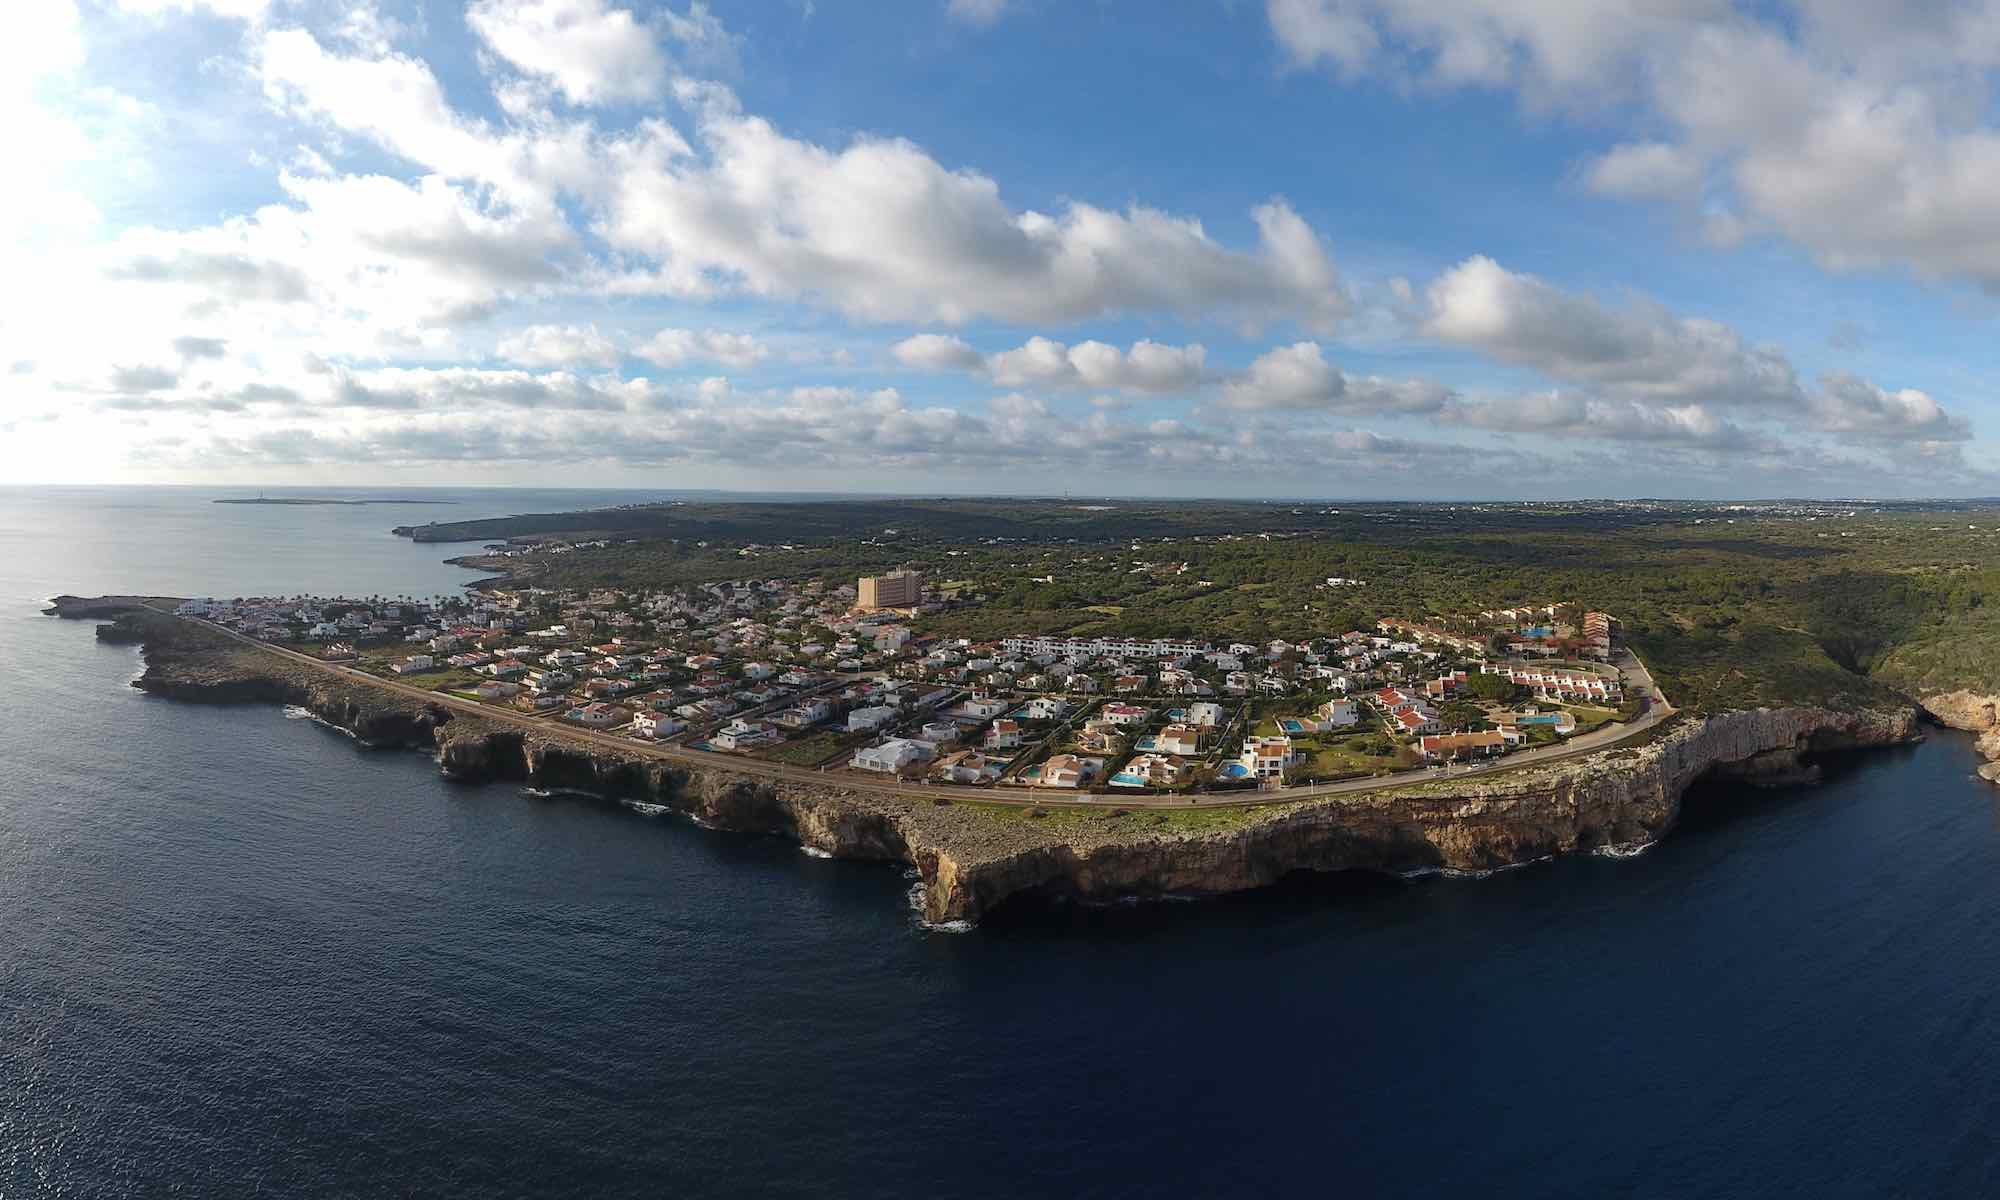 Aerial view of S'Algar in Menorca across the Marine Reserve Isla del Aire